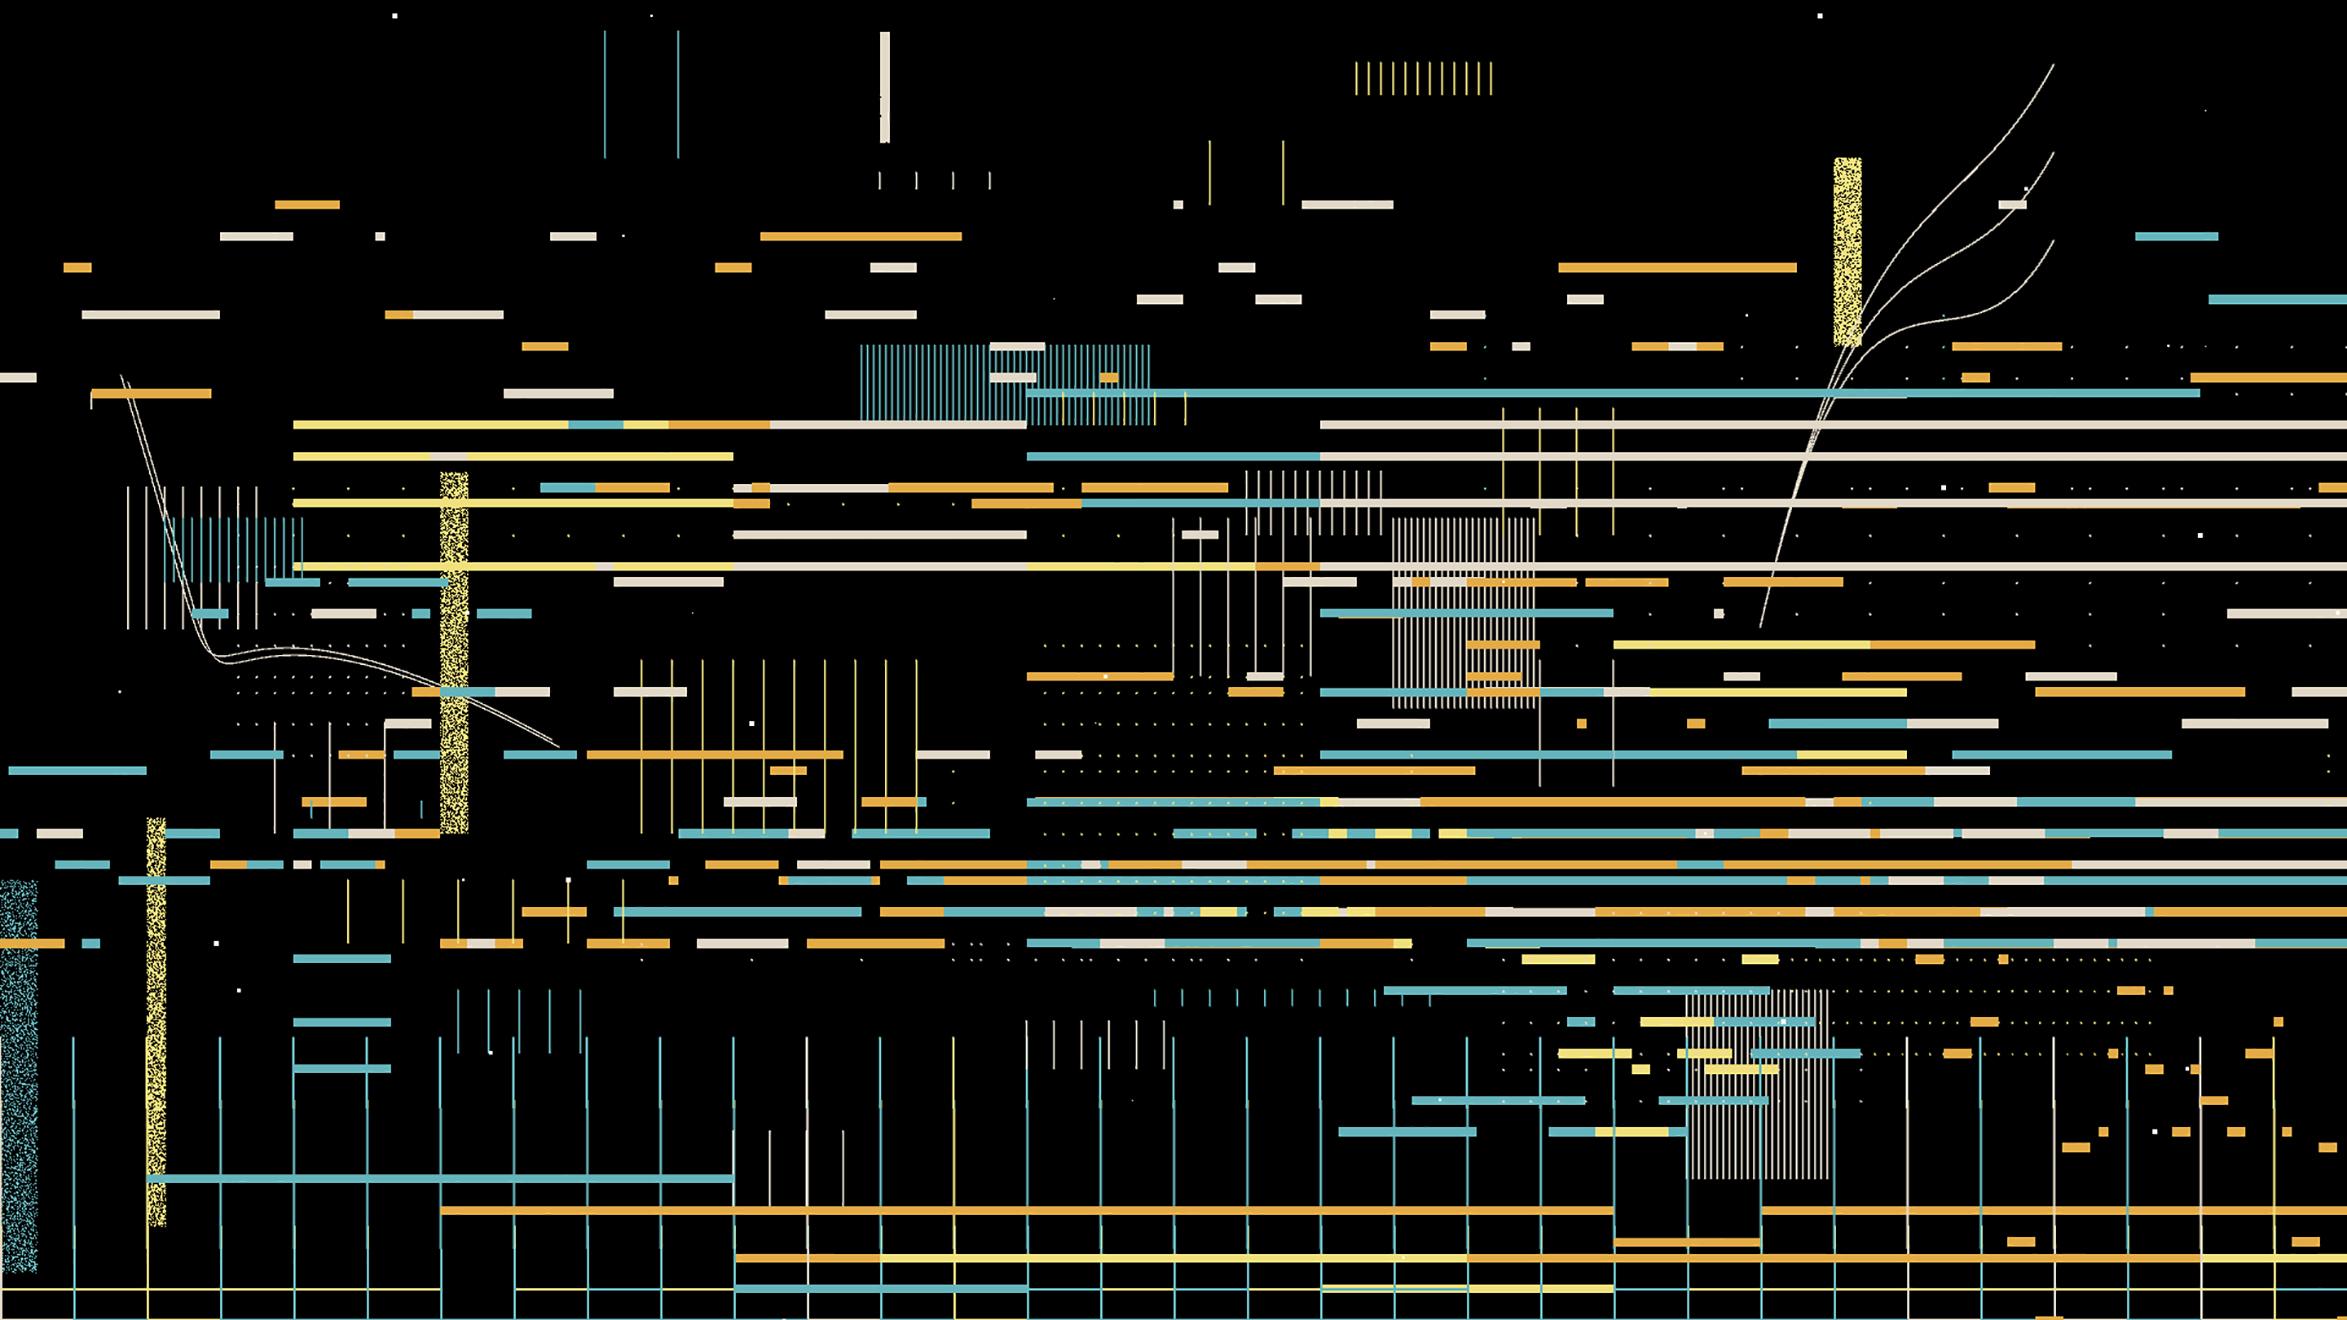 https://graphic.elisava.net/wp-content/uploads/2020/09/6_playmodes_master_data_design_elisava_barcelona.jpg